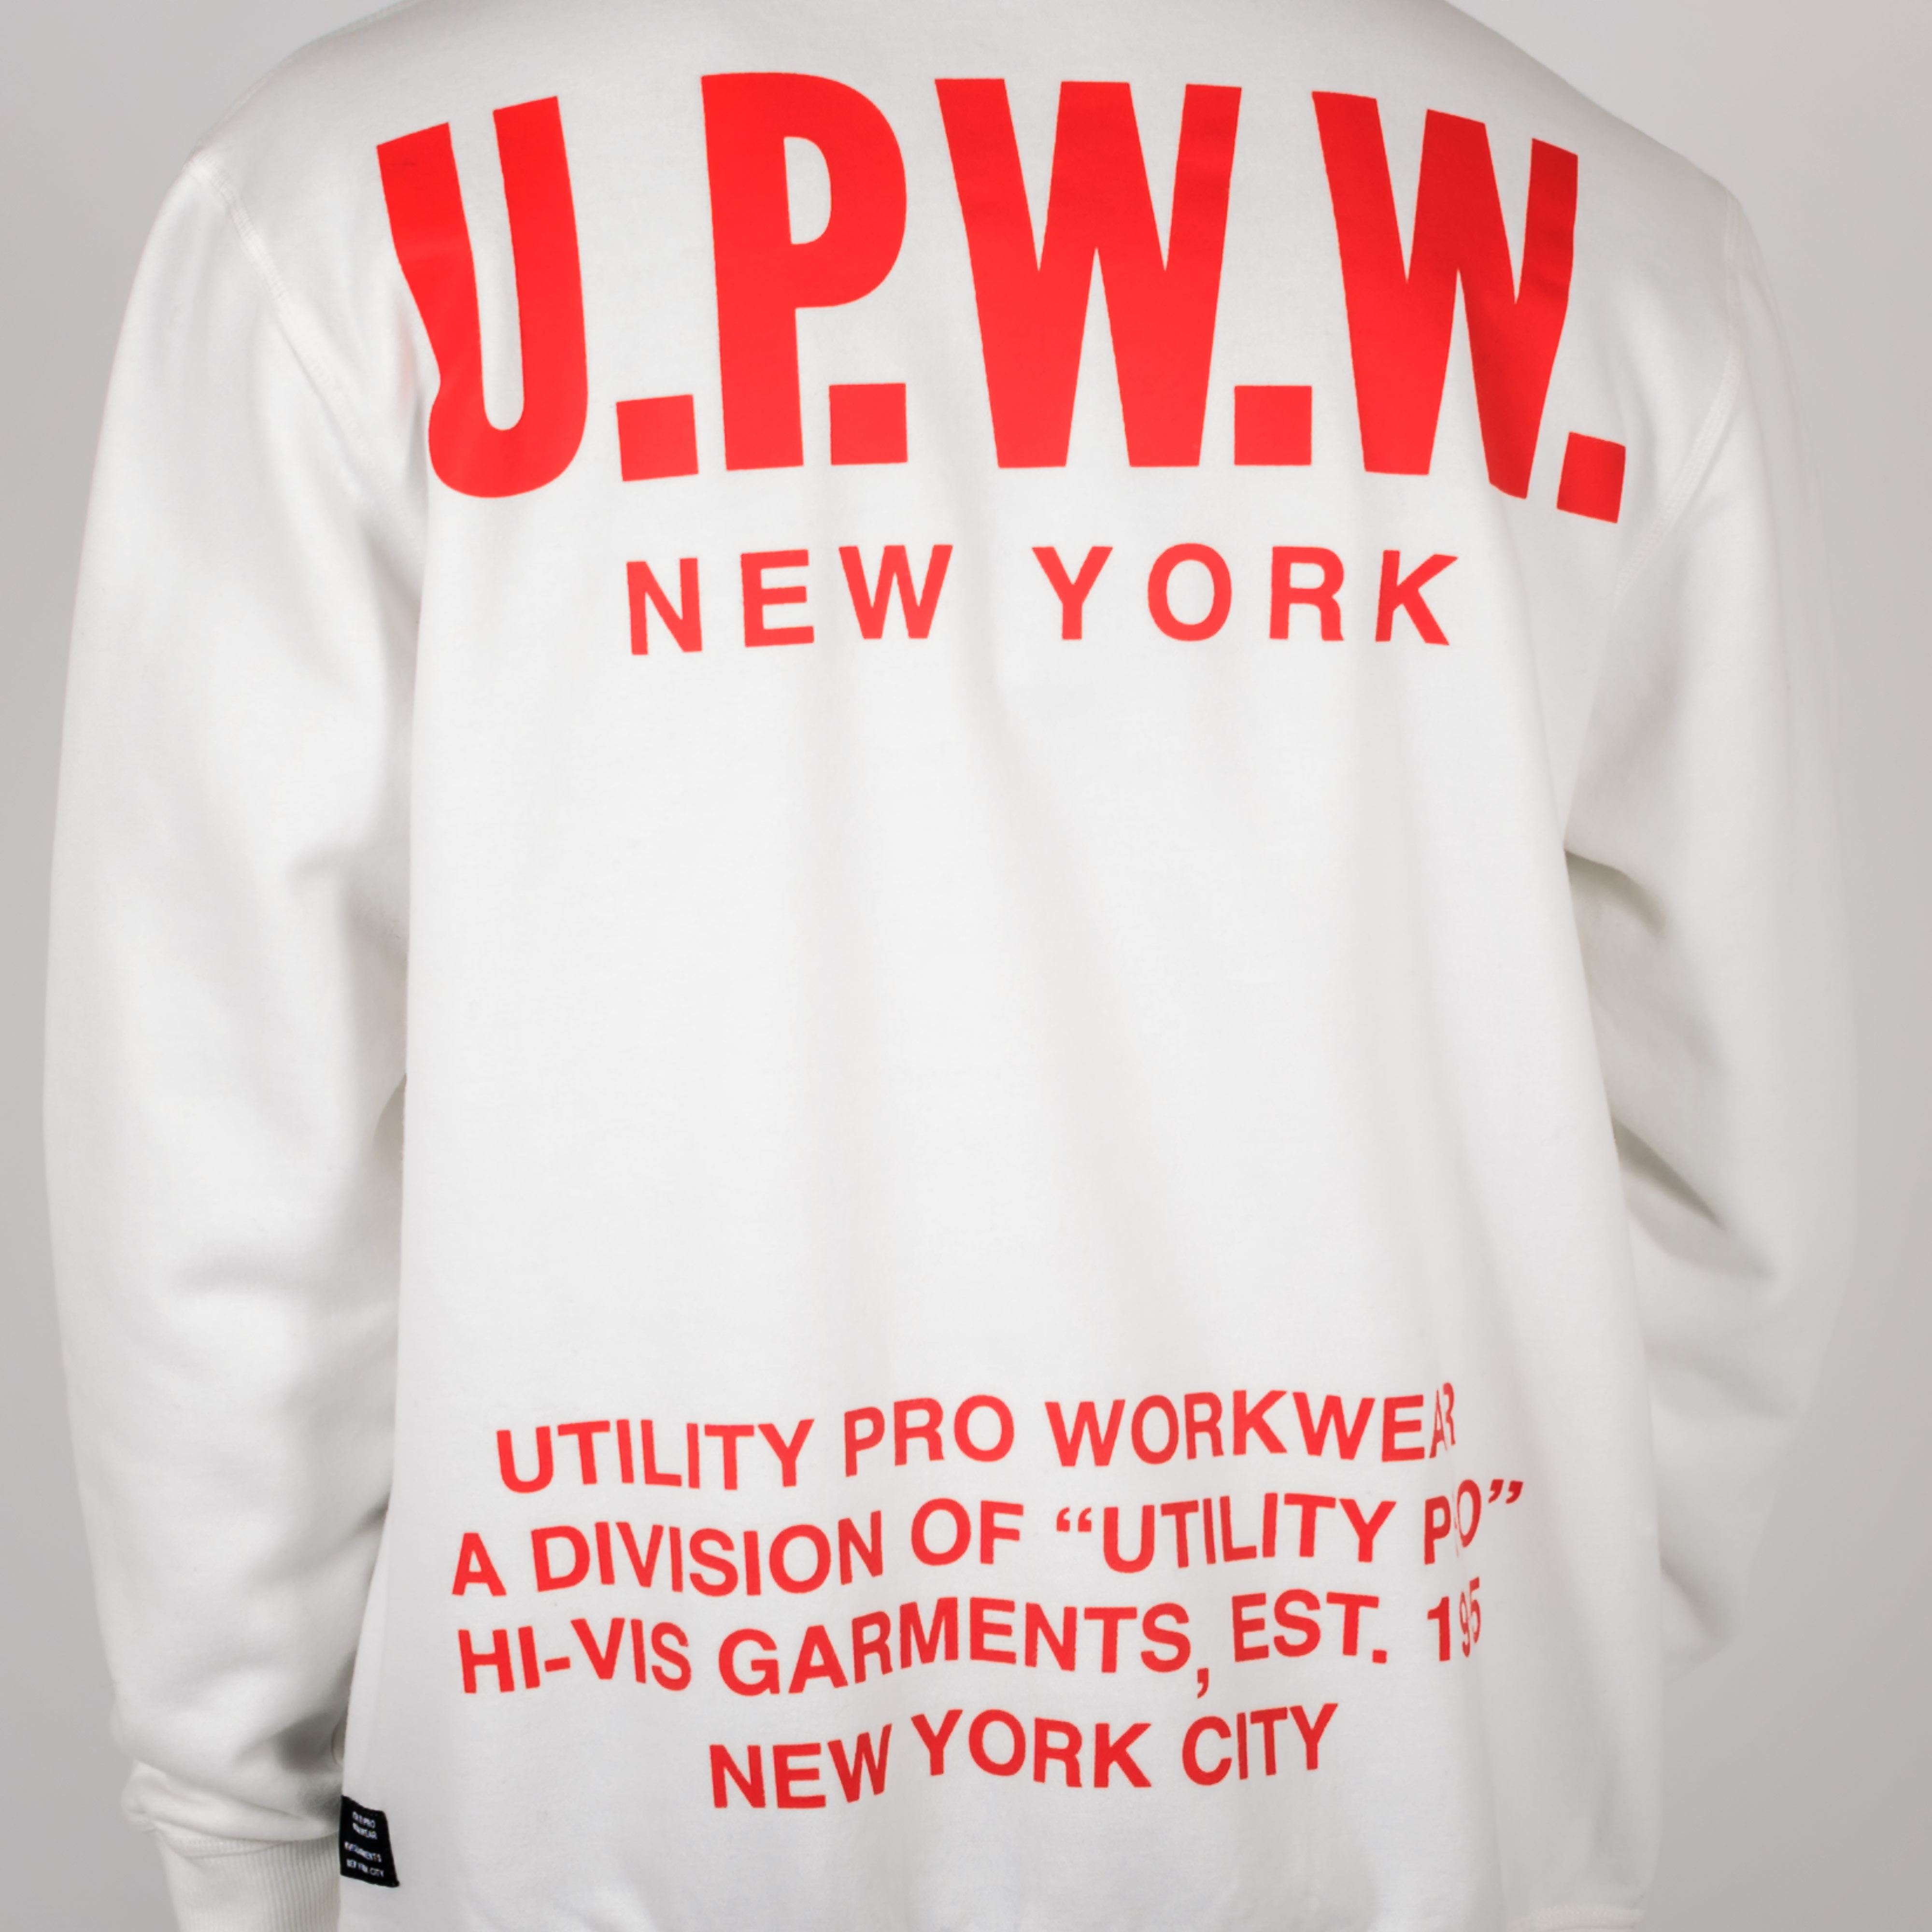 U.P.W.W. New York